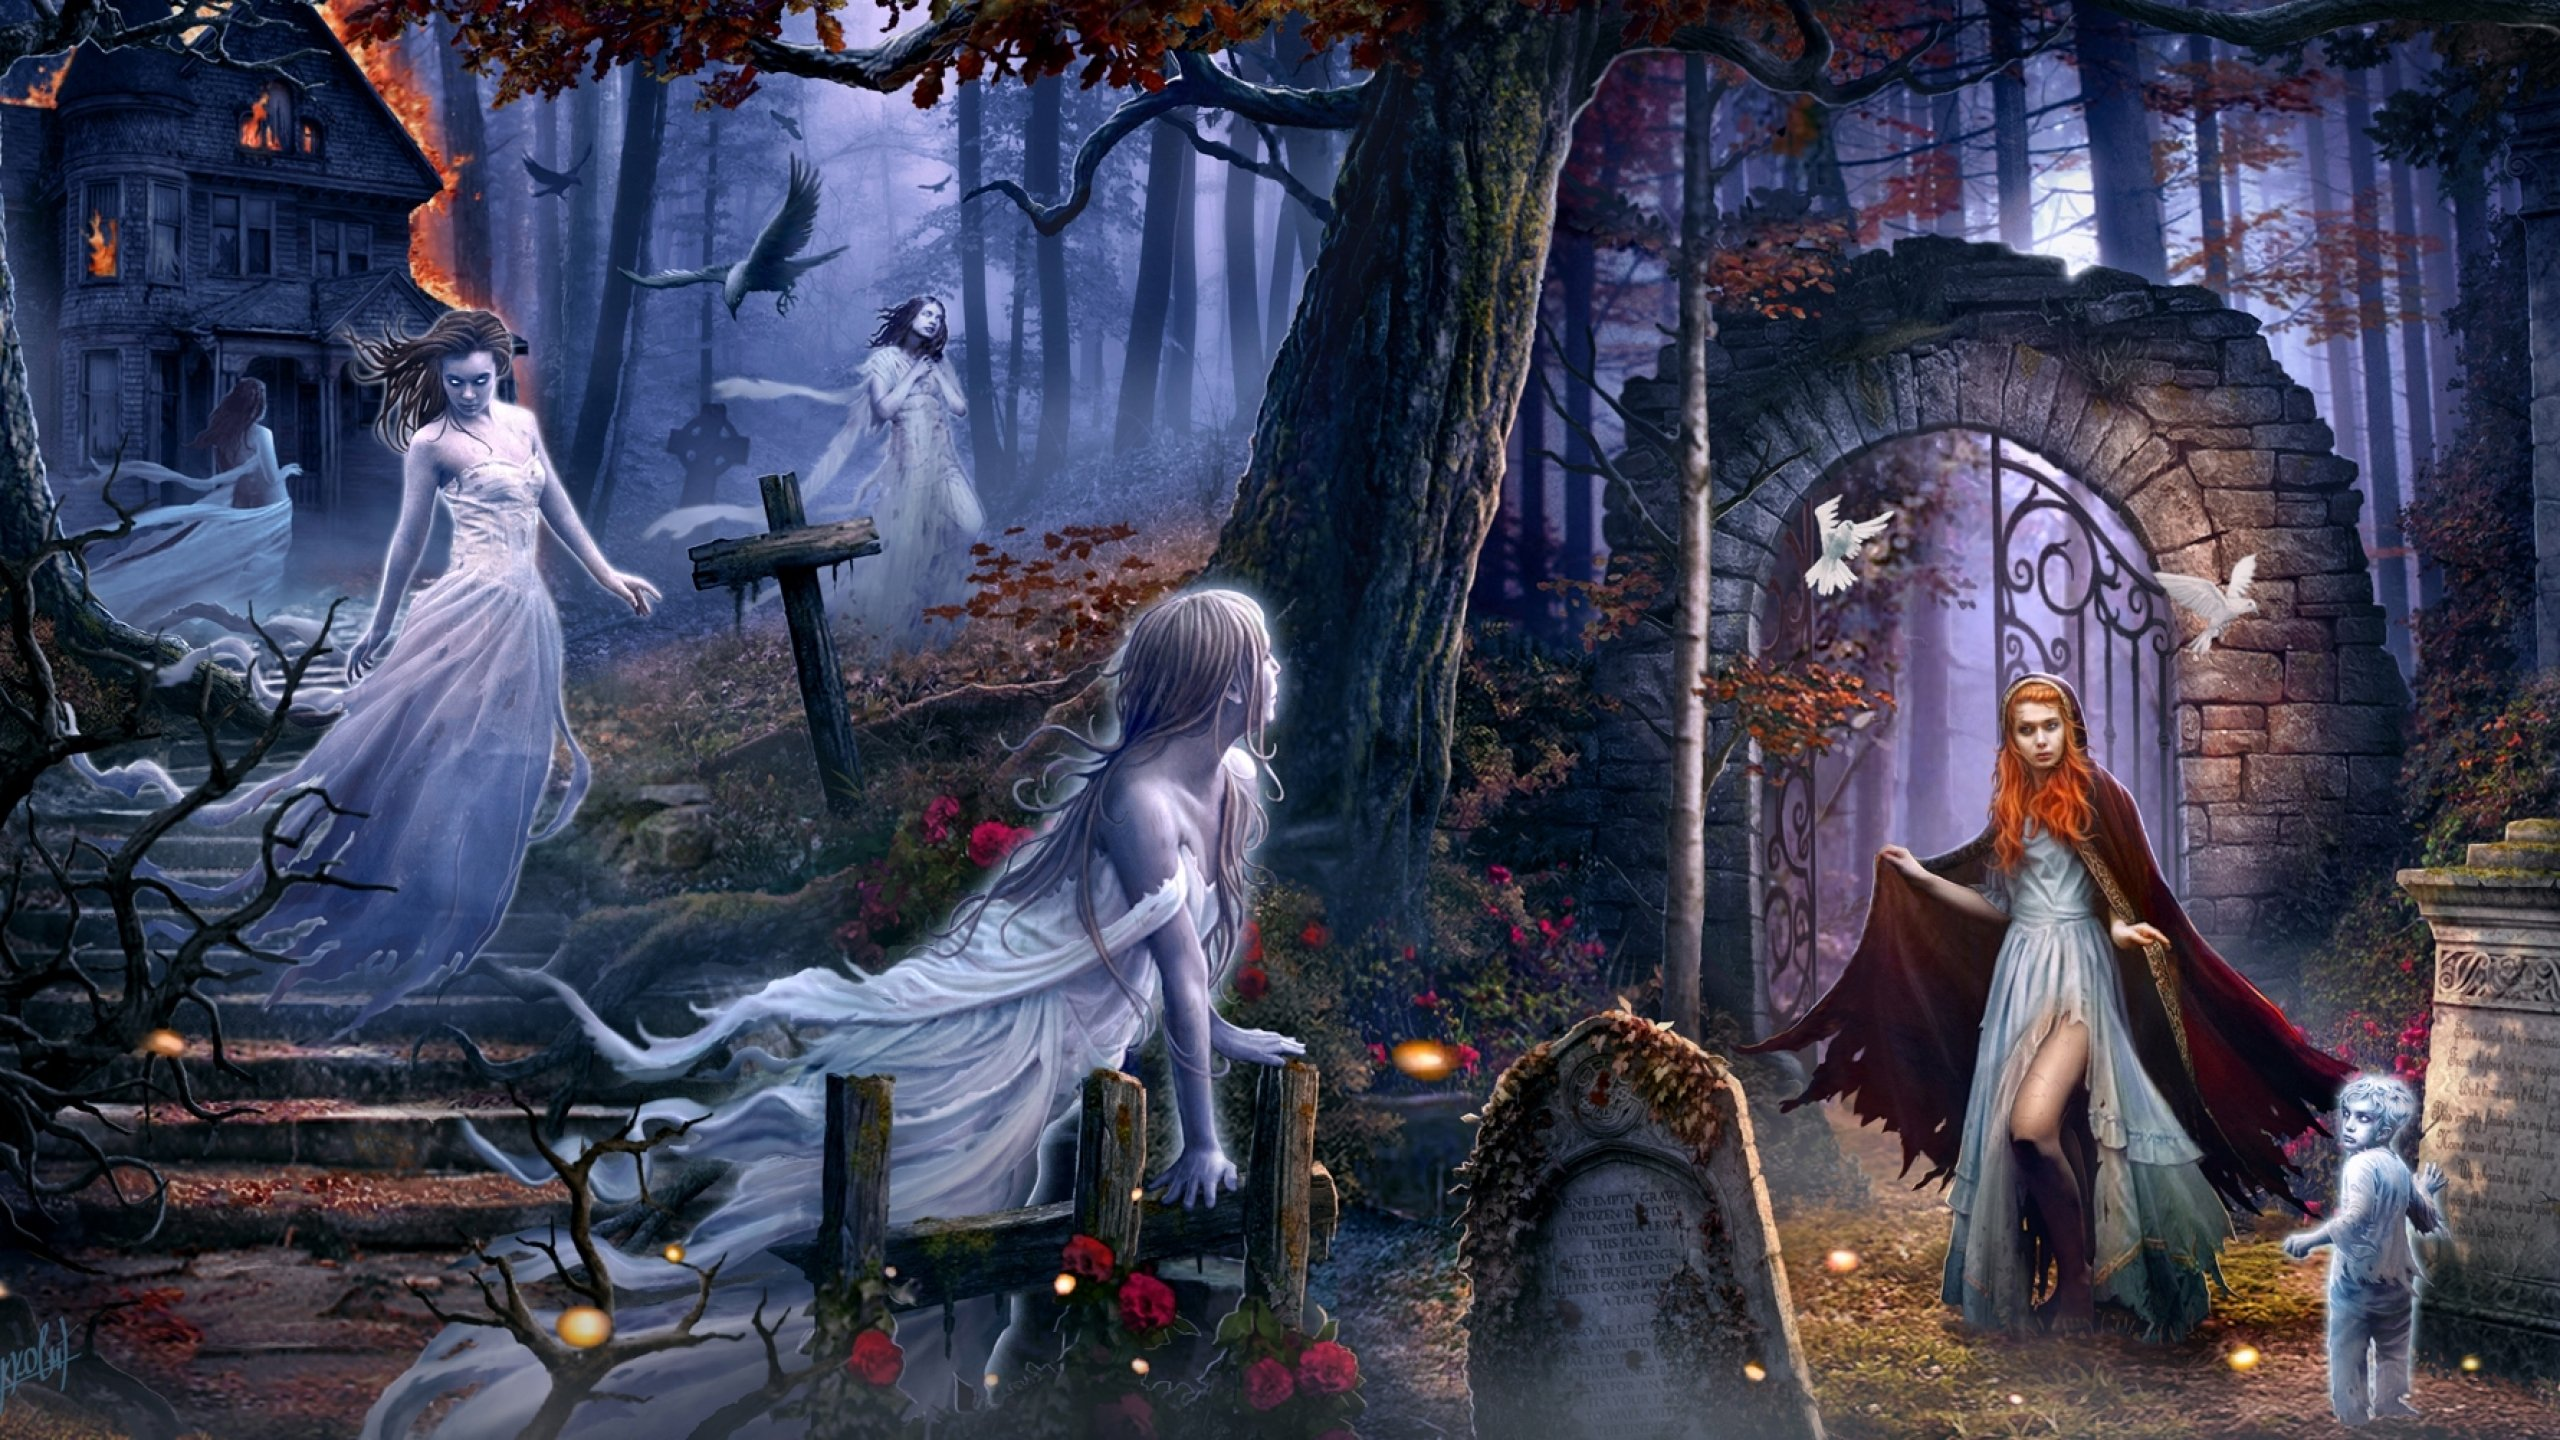 dark ghost fantasy art artwork horror spooky creepy halloween gothic wallpaper 2560x1440 656434 wallpaperup